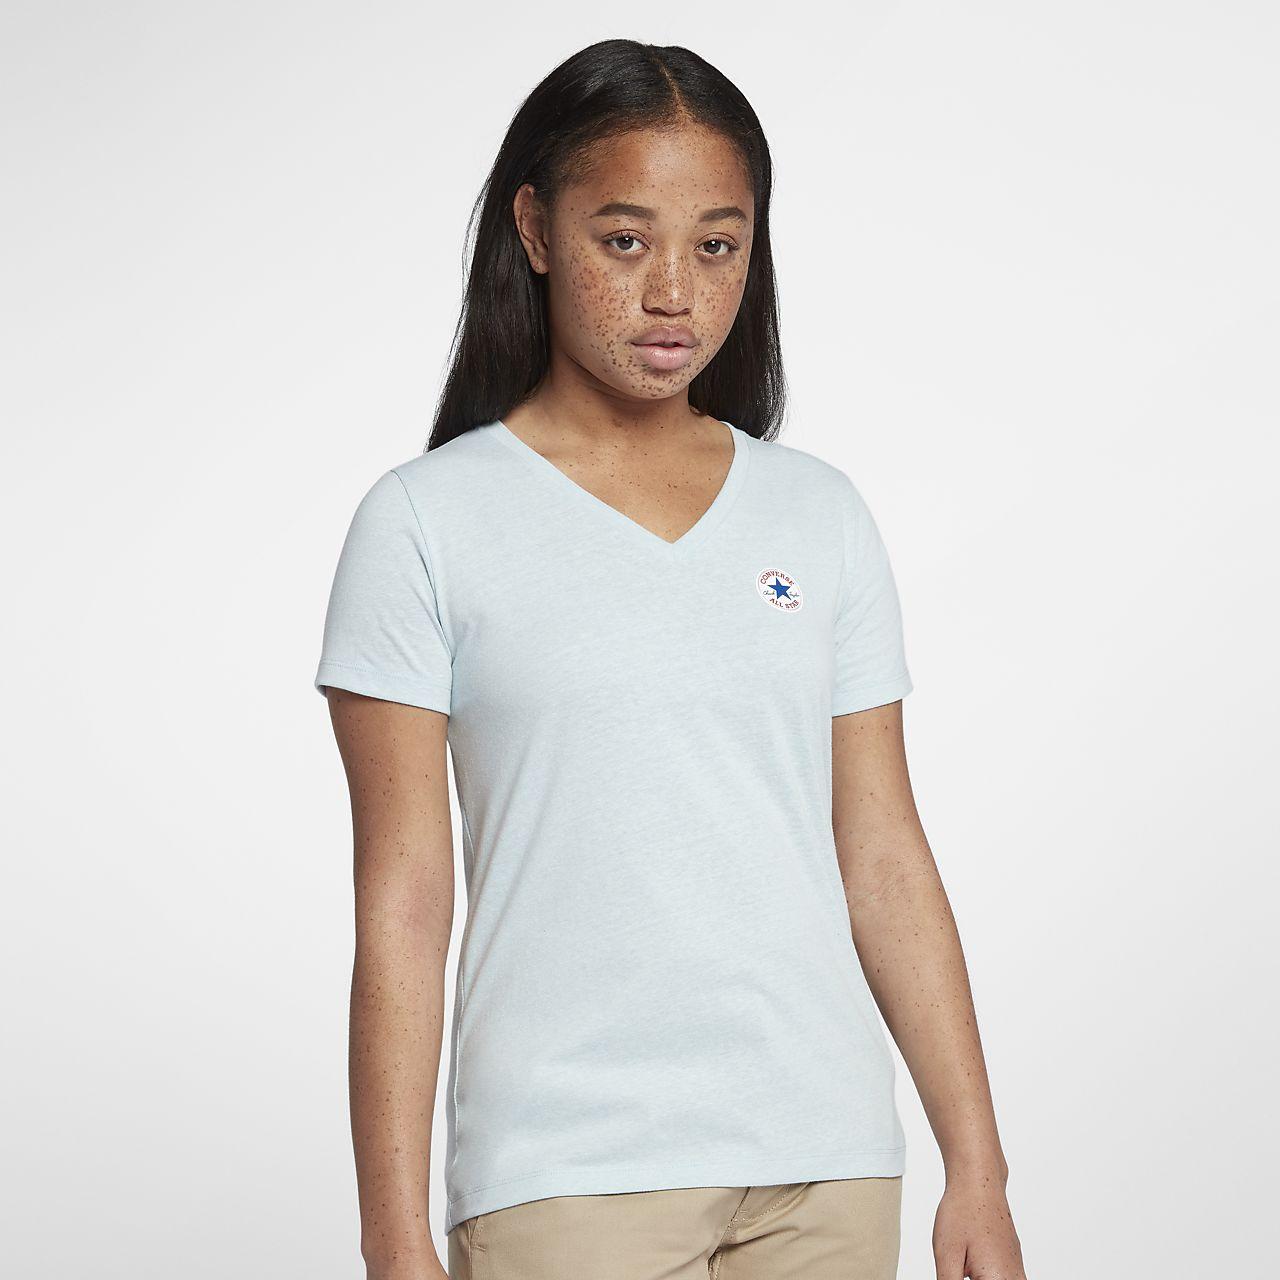 Converse Core Tri-Blend Women's V-Neck T-Shirt